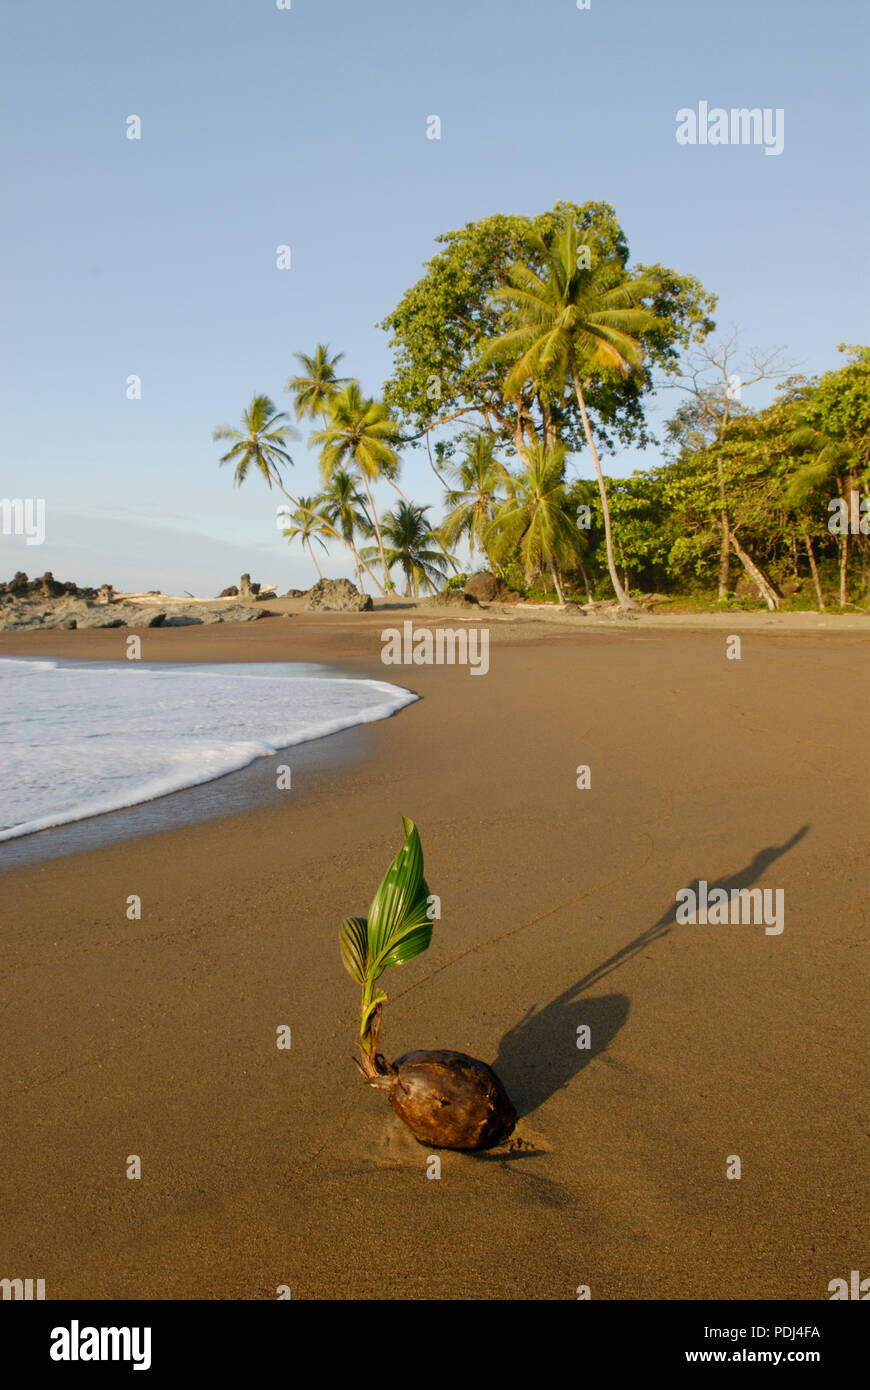 Coconut bourgeonnant sur plage, parc national de Corcovado, Costa Rica Photo Stock